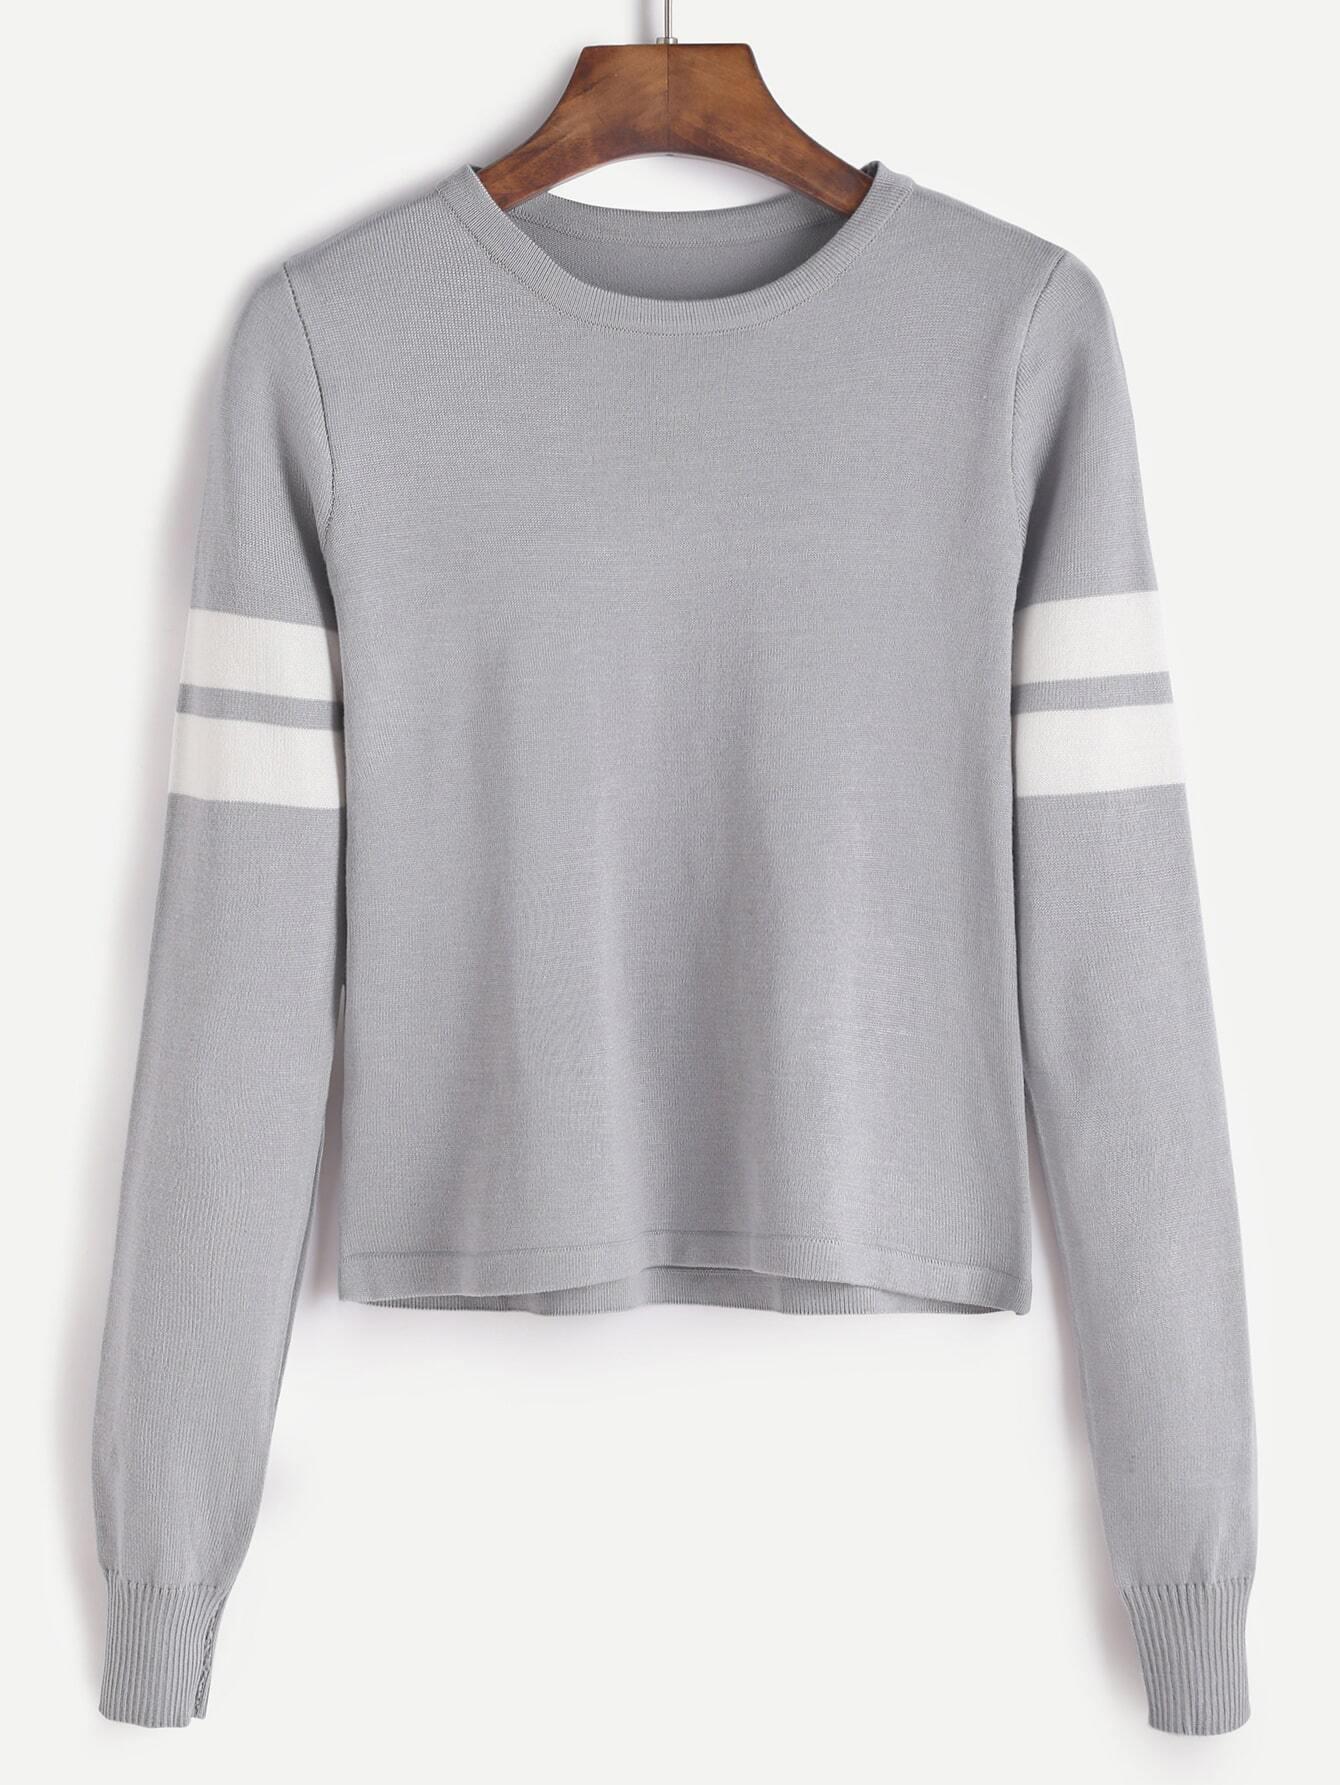 4fc92c3156d Grey Varsity Striped Sweater EmmaCloth-Women Fast Fashion Online